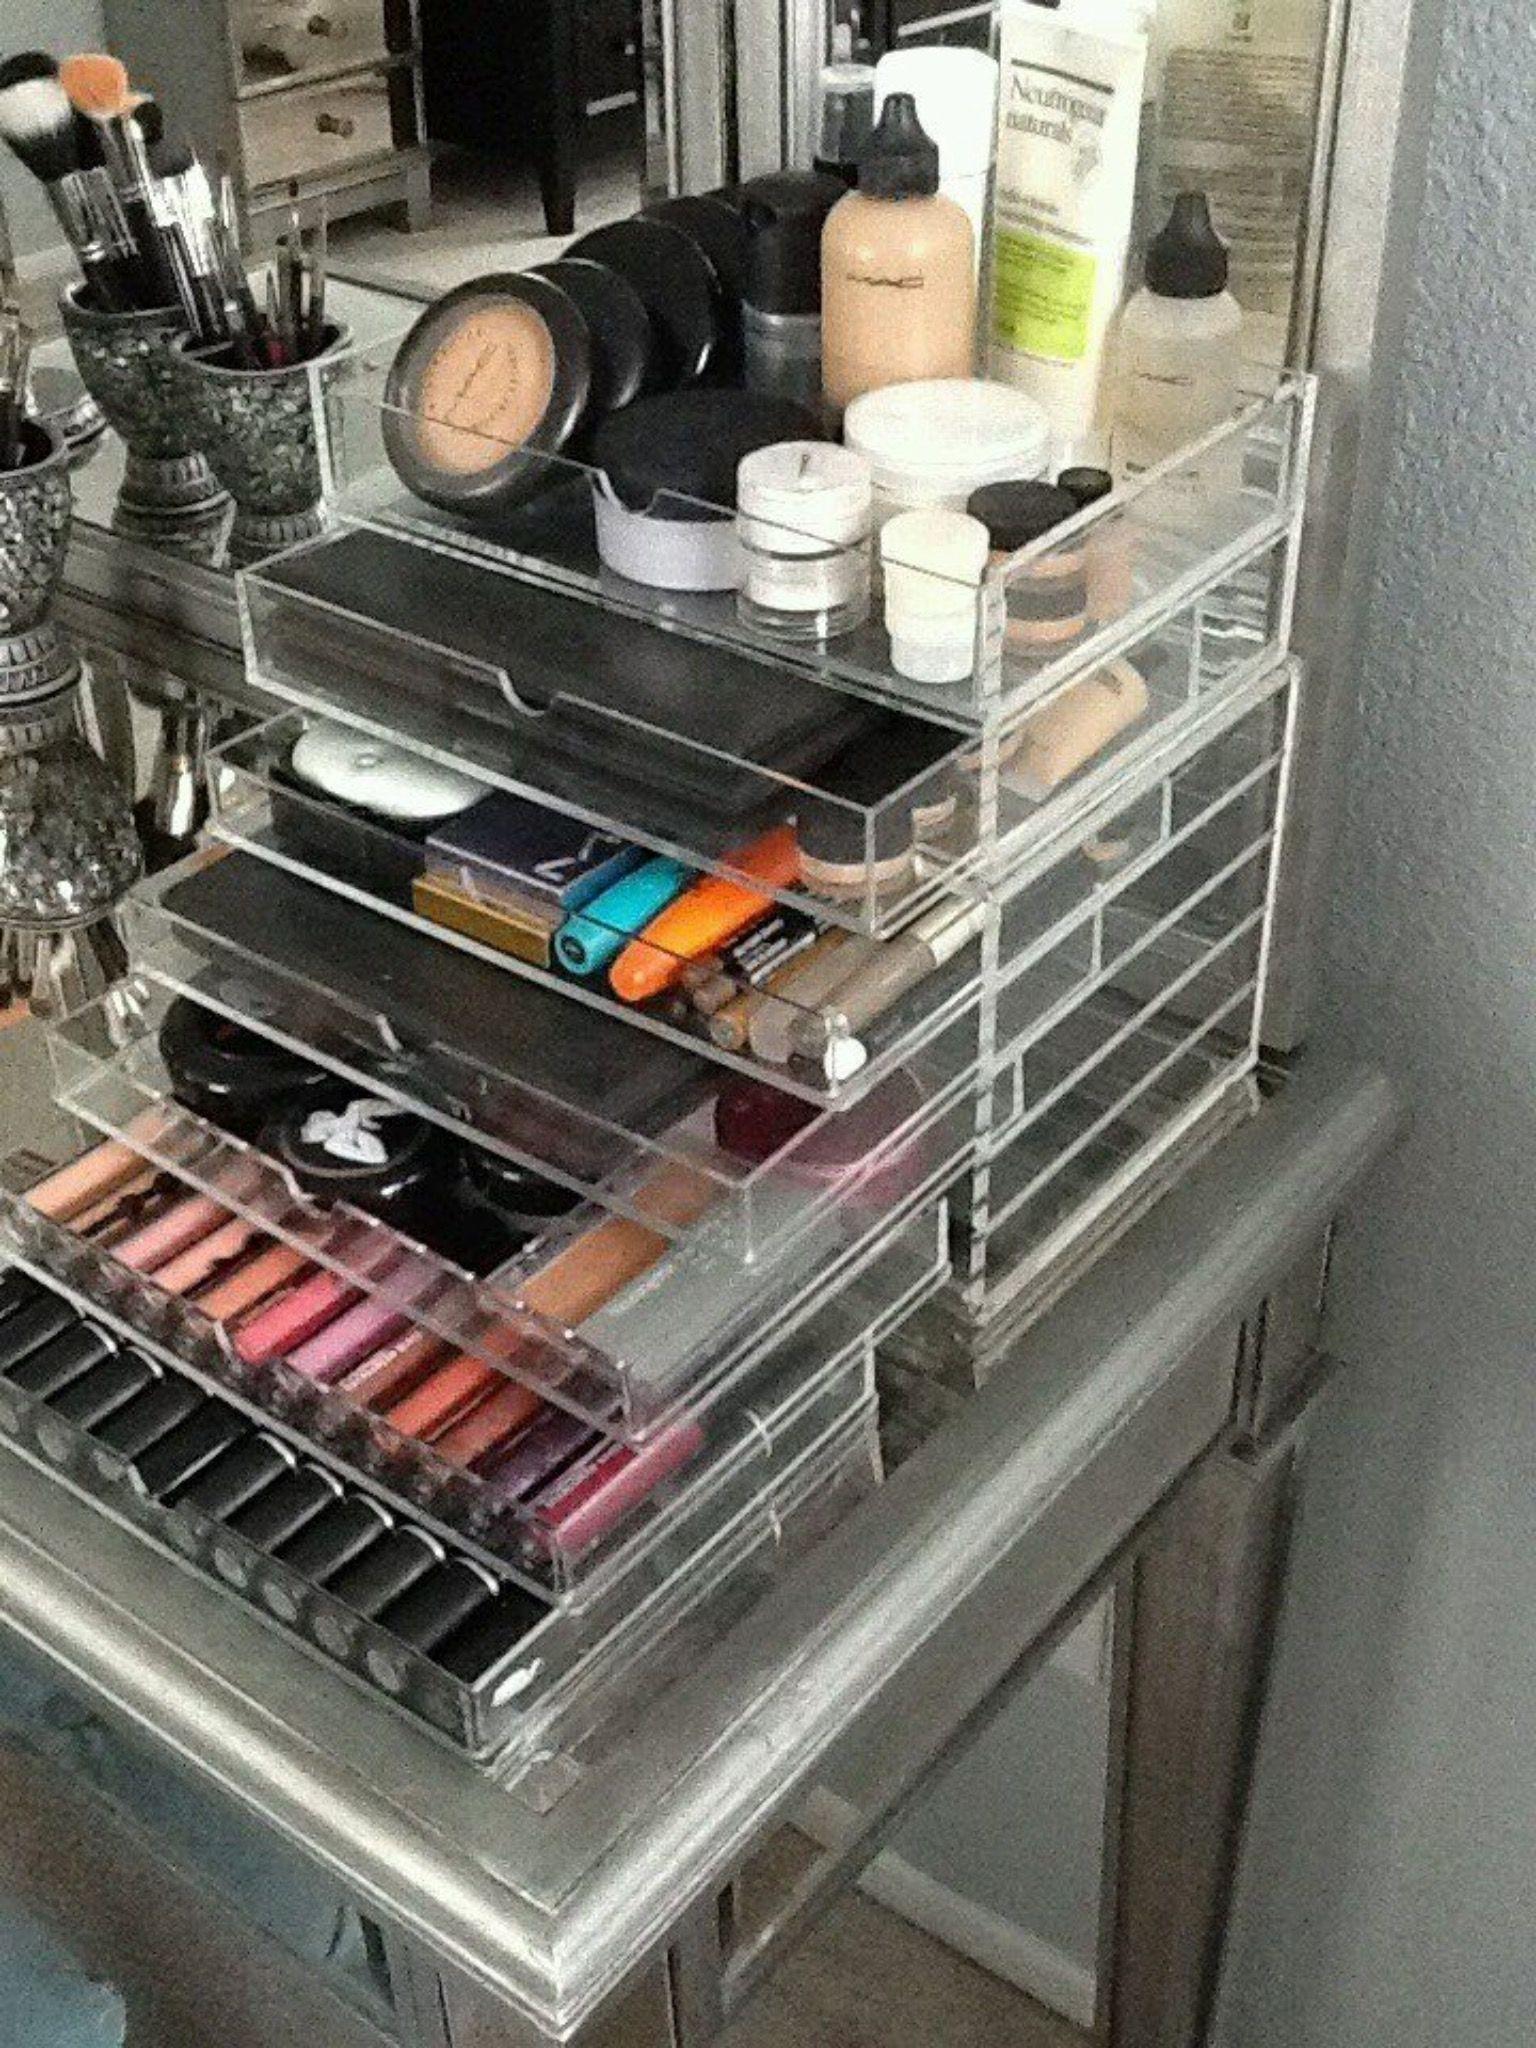 Pin by Elizabeth Walkonis on Organization   Makeup storage ...